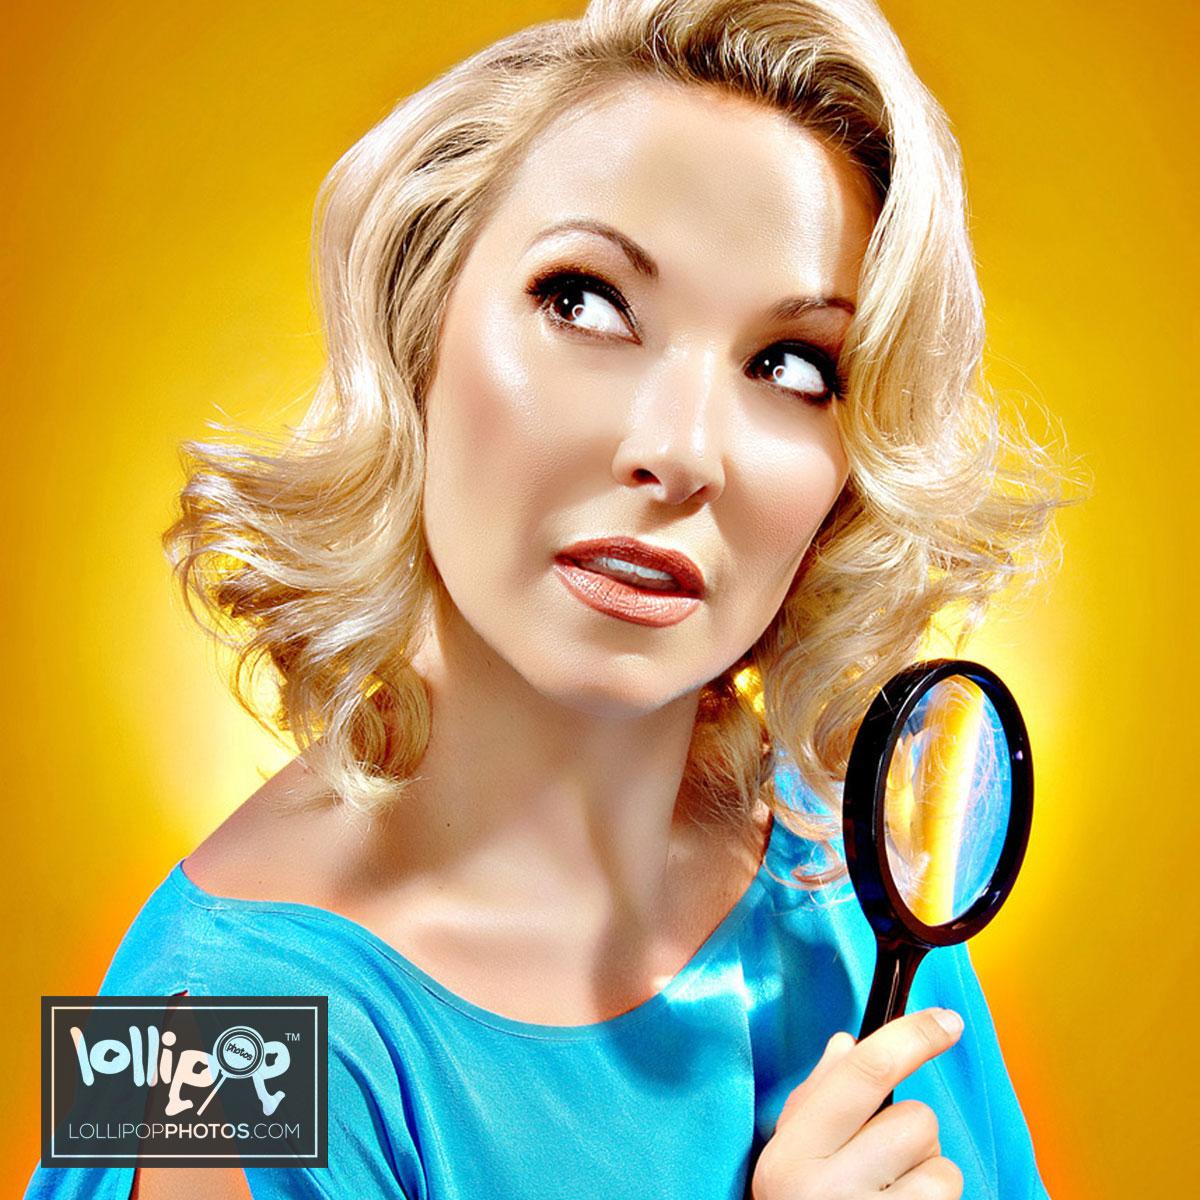 msdig-nora-canfield-lollipop-photos-315.jpg